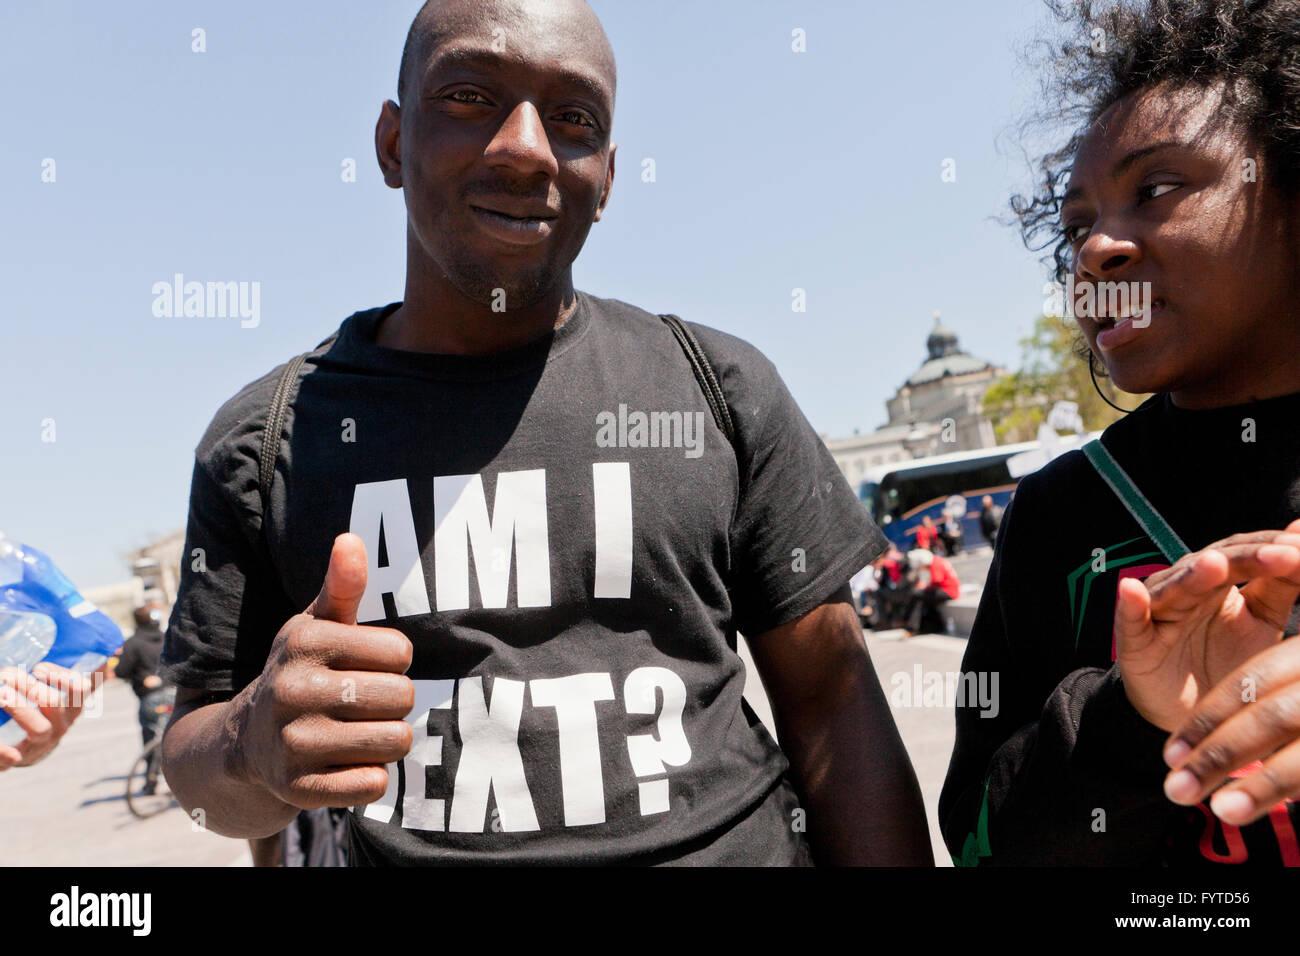 Black Lives Matter activist wearing 'Am I Next?' t-shirt - USA - Stock Image